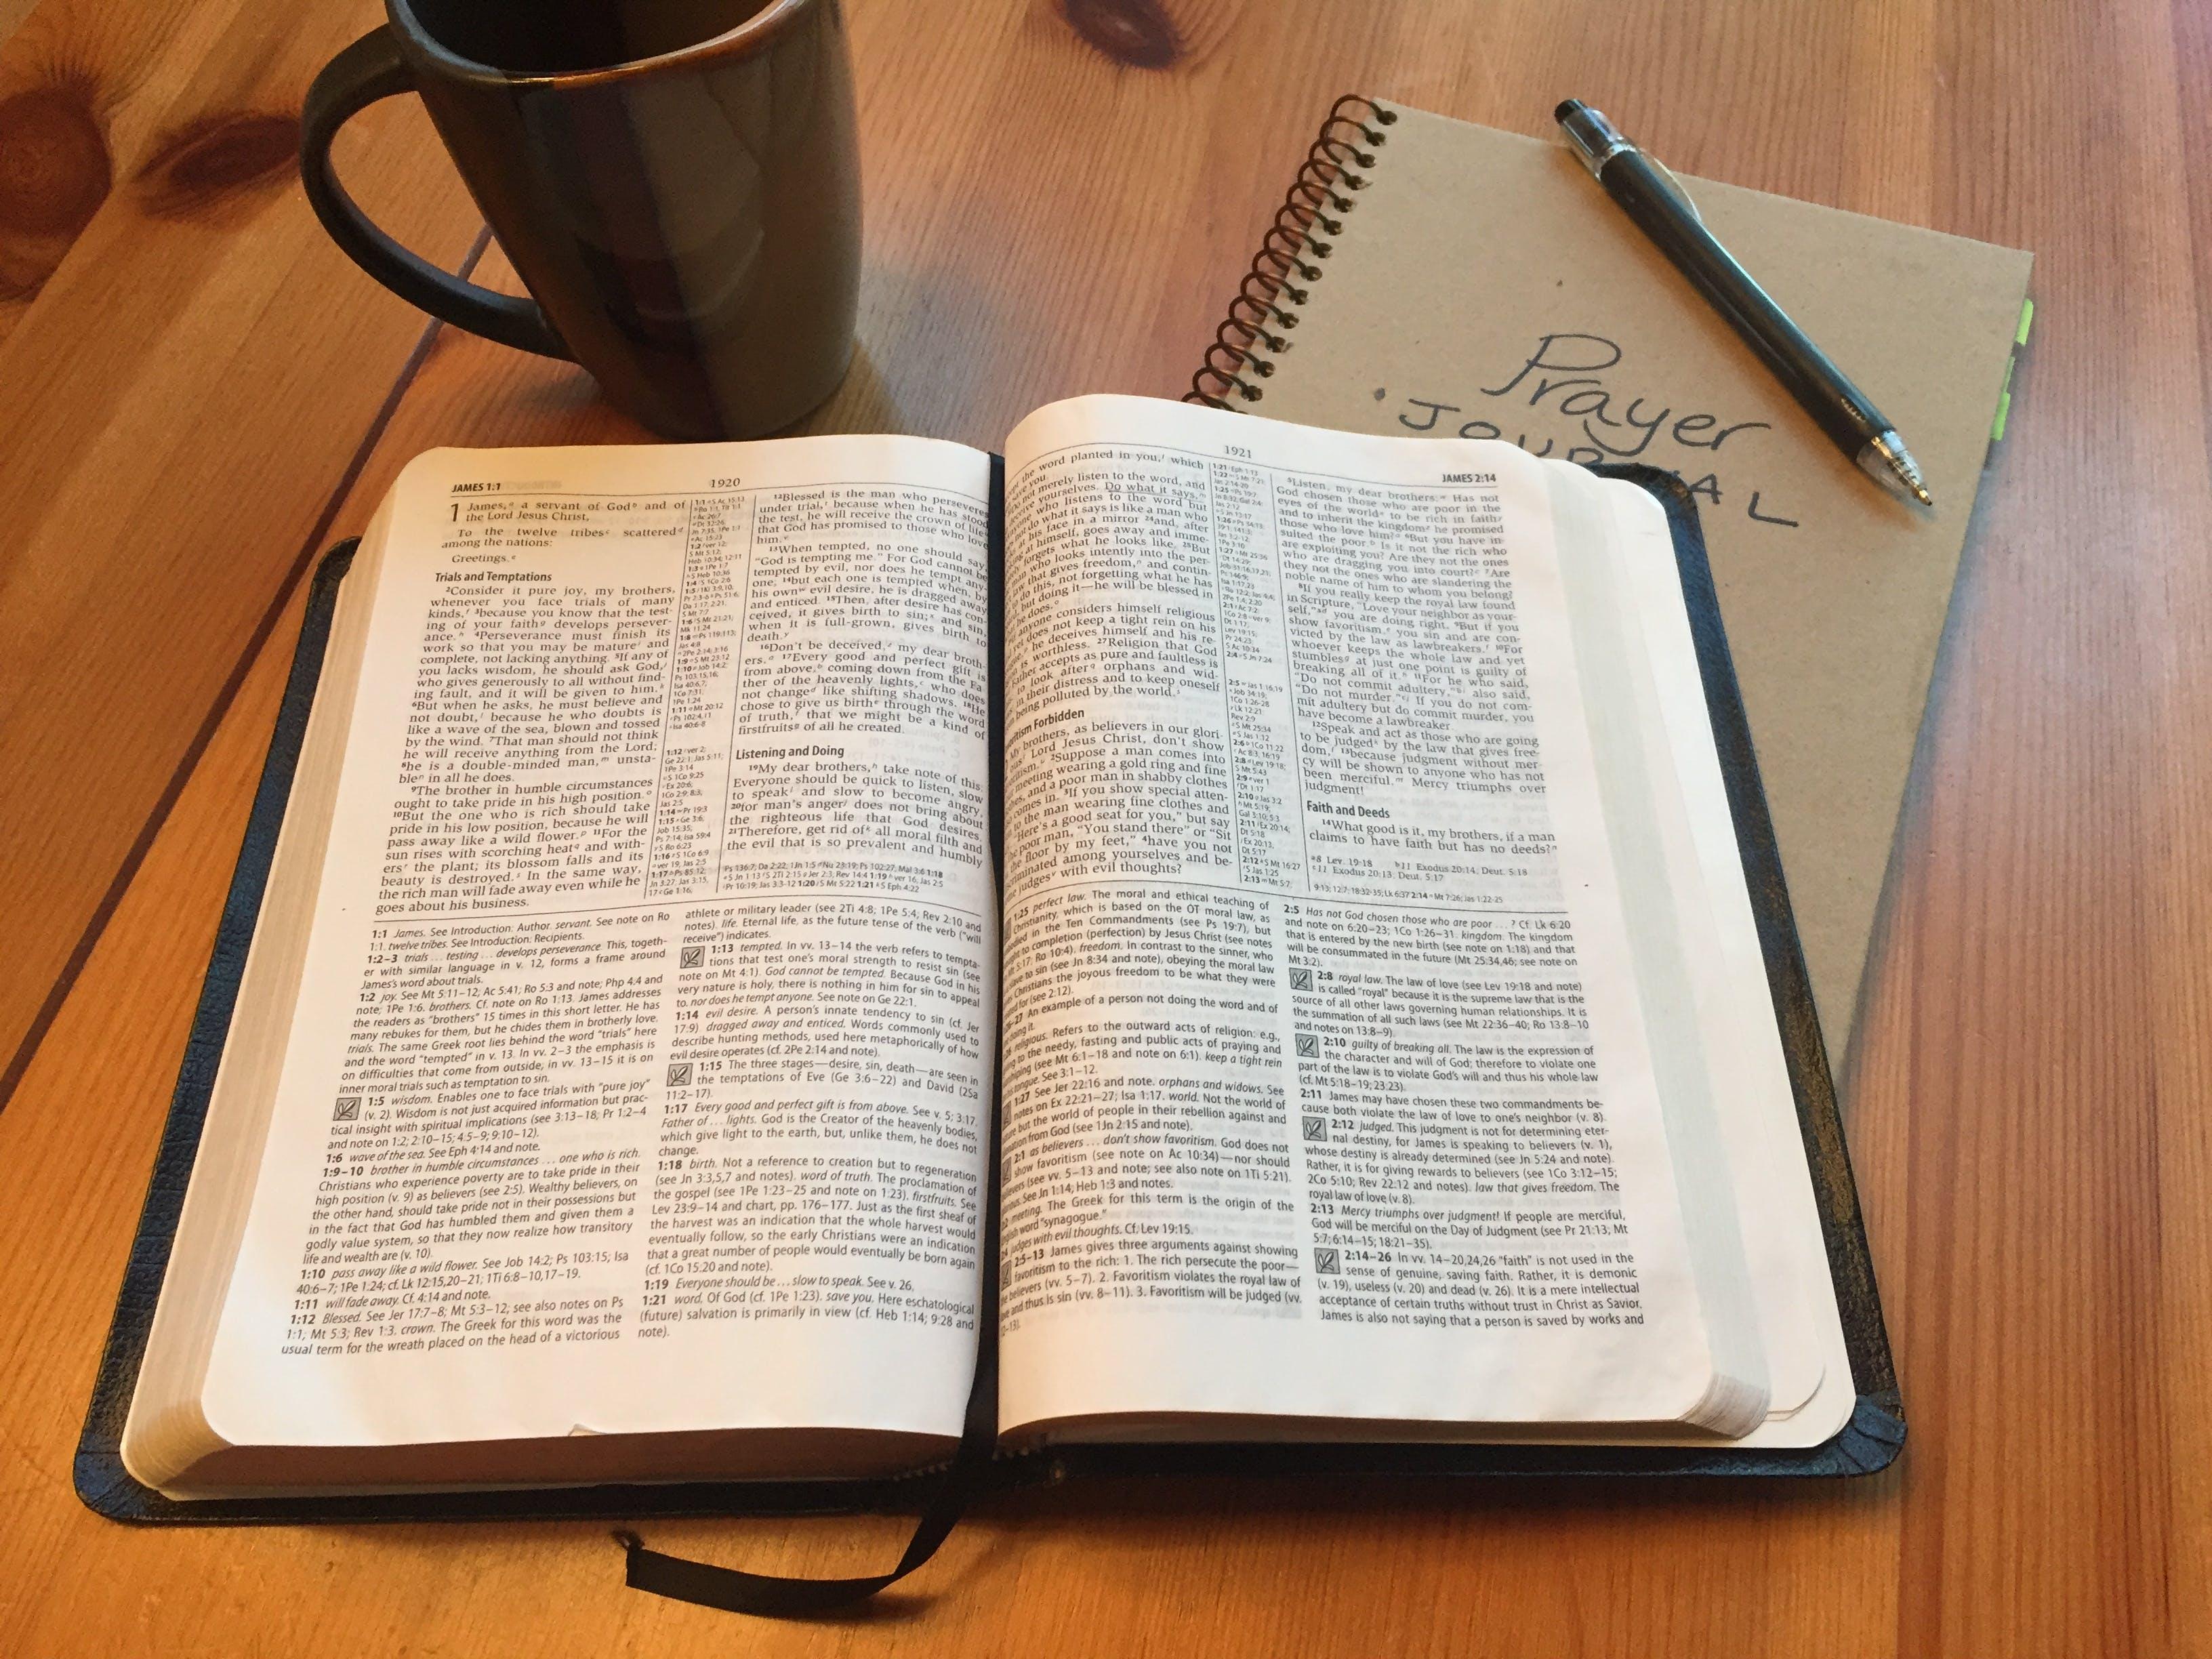 Biblia, csendes idő, ima